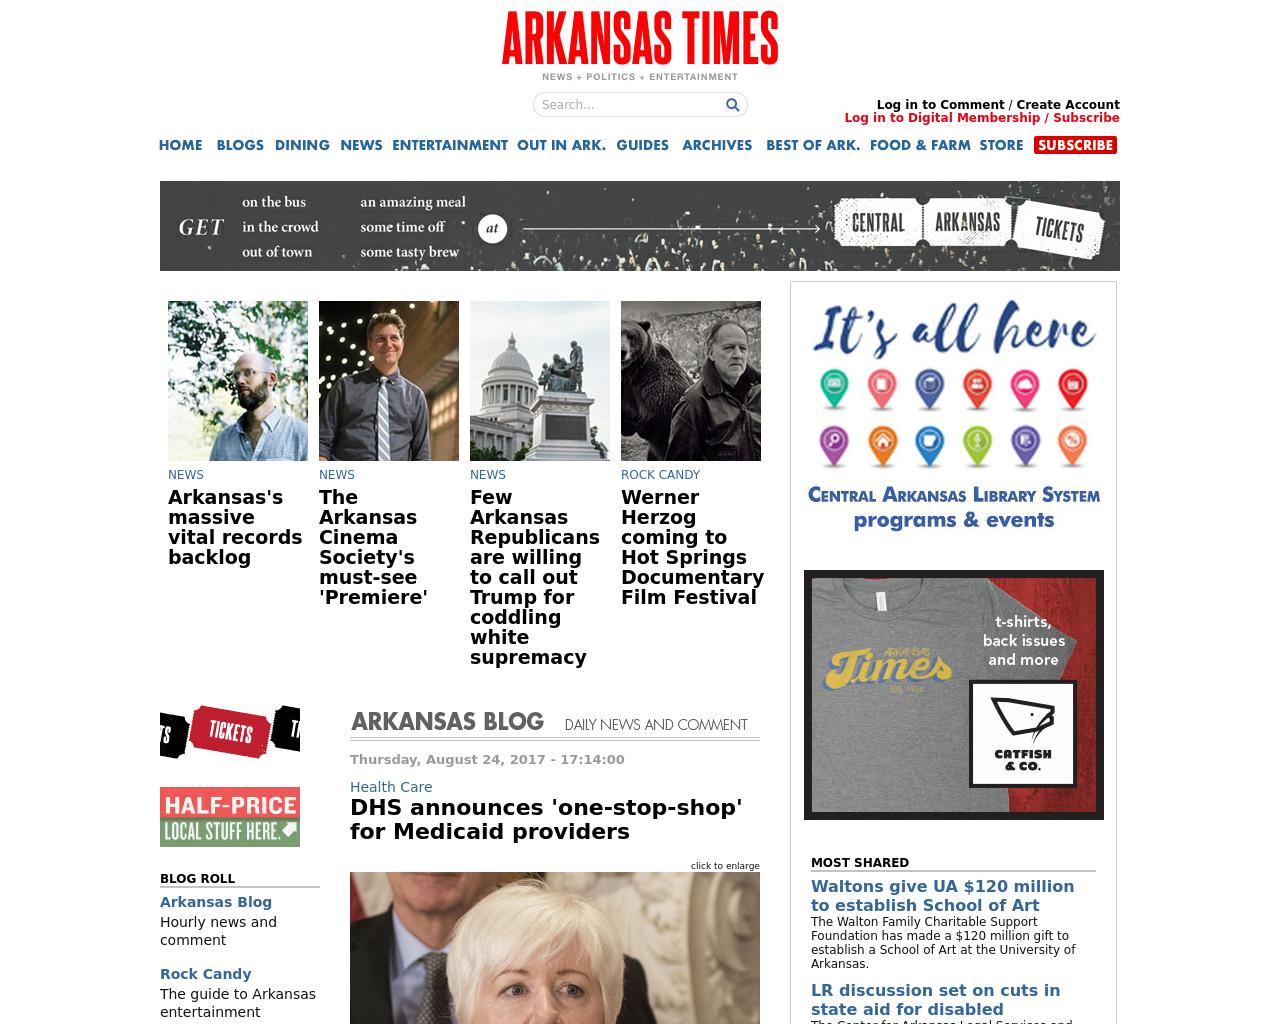 Arkansas-Times-Advertising-Reviews-Pricing